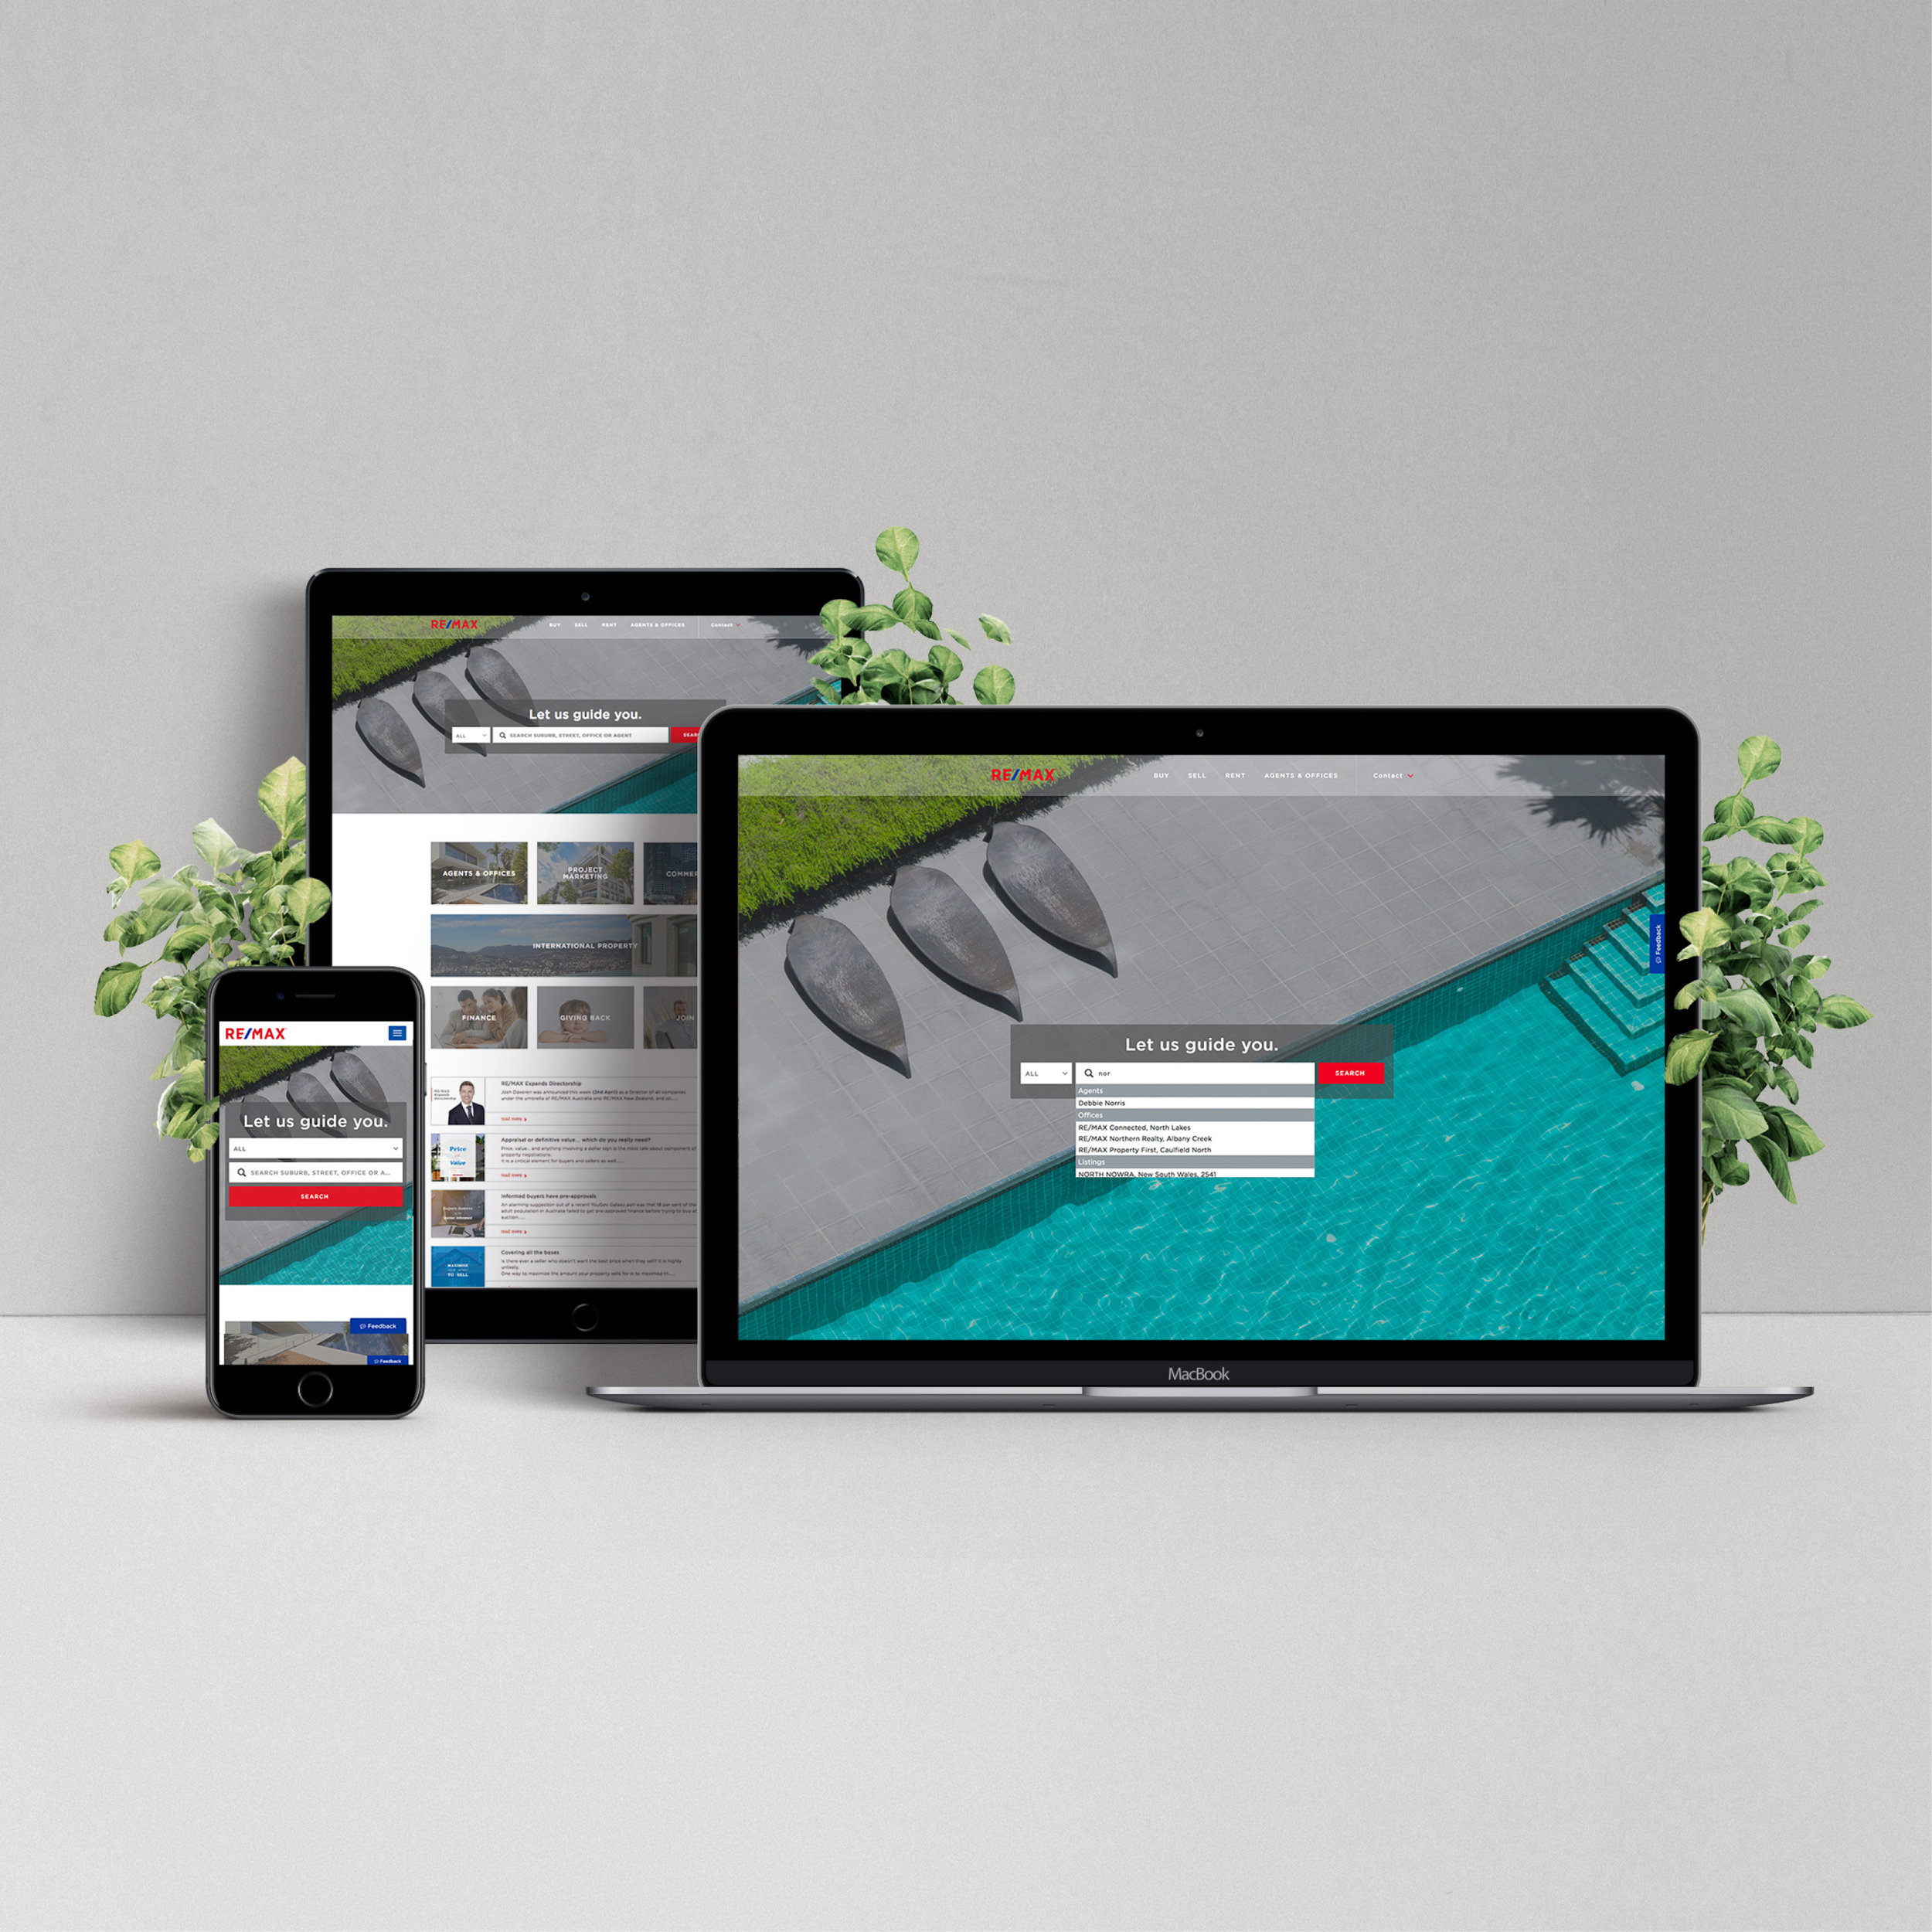 RE/MAX Australia & RE/MAX New Zealand website re-design